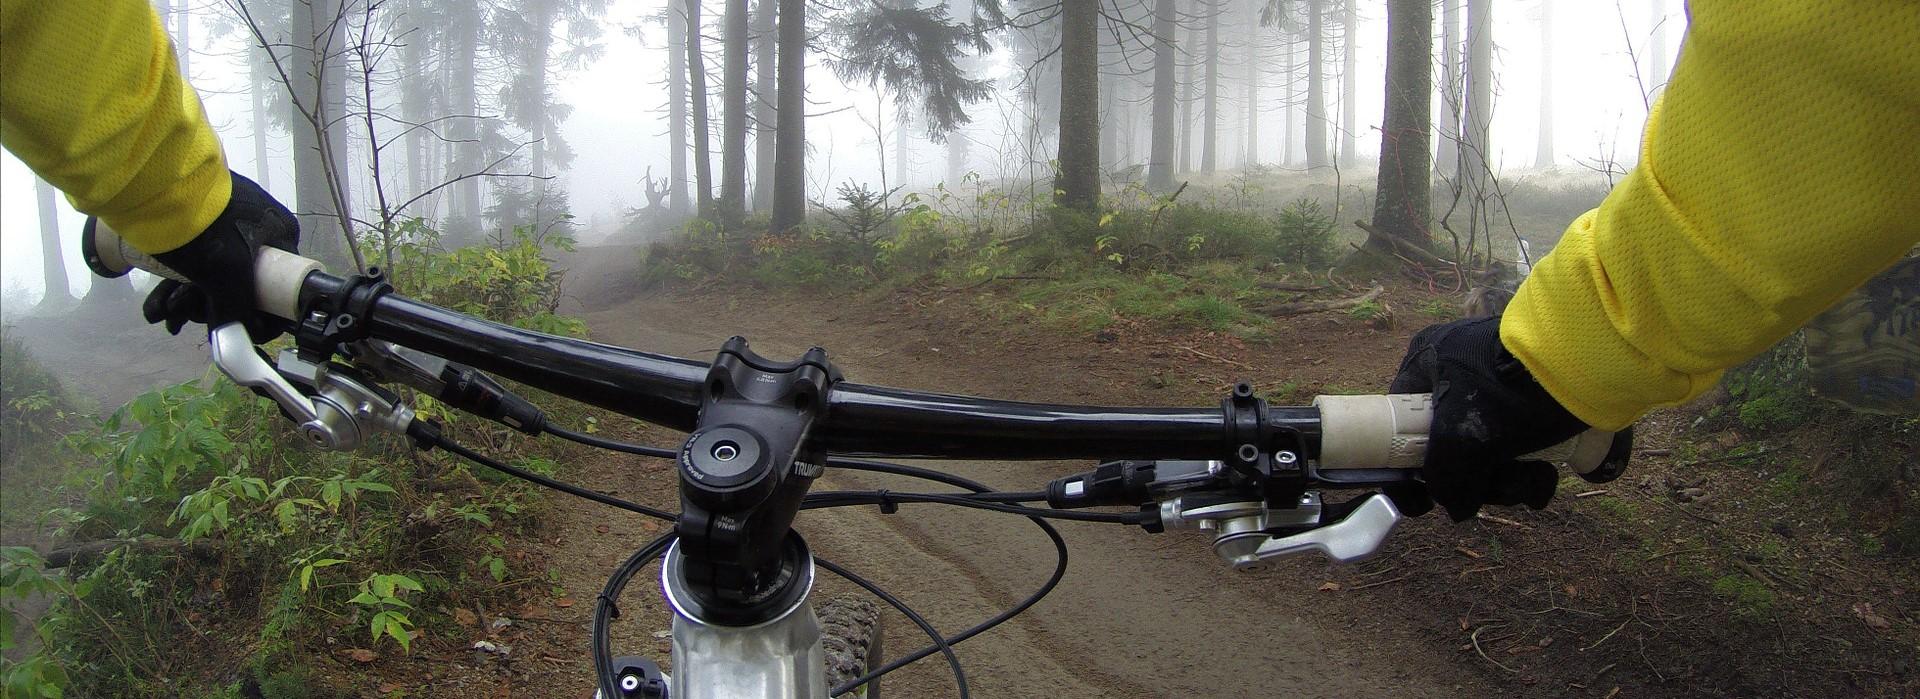 Tohto cyklistu určite nebolia kĺby,